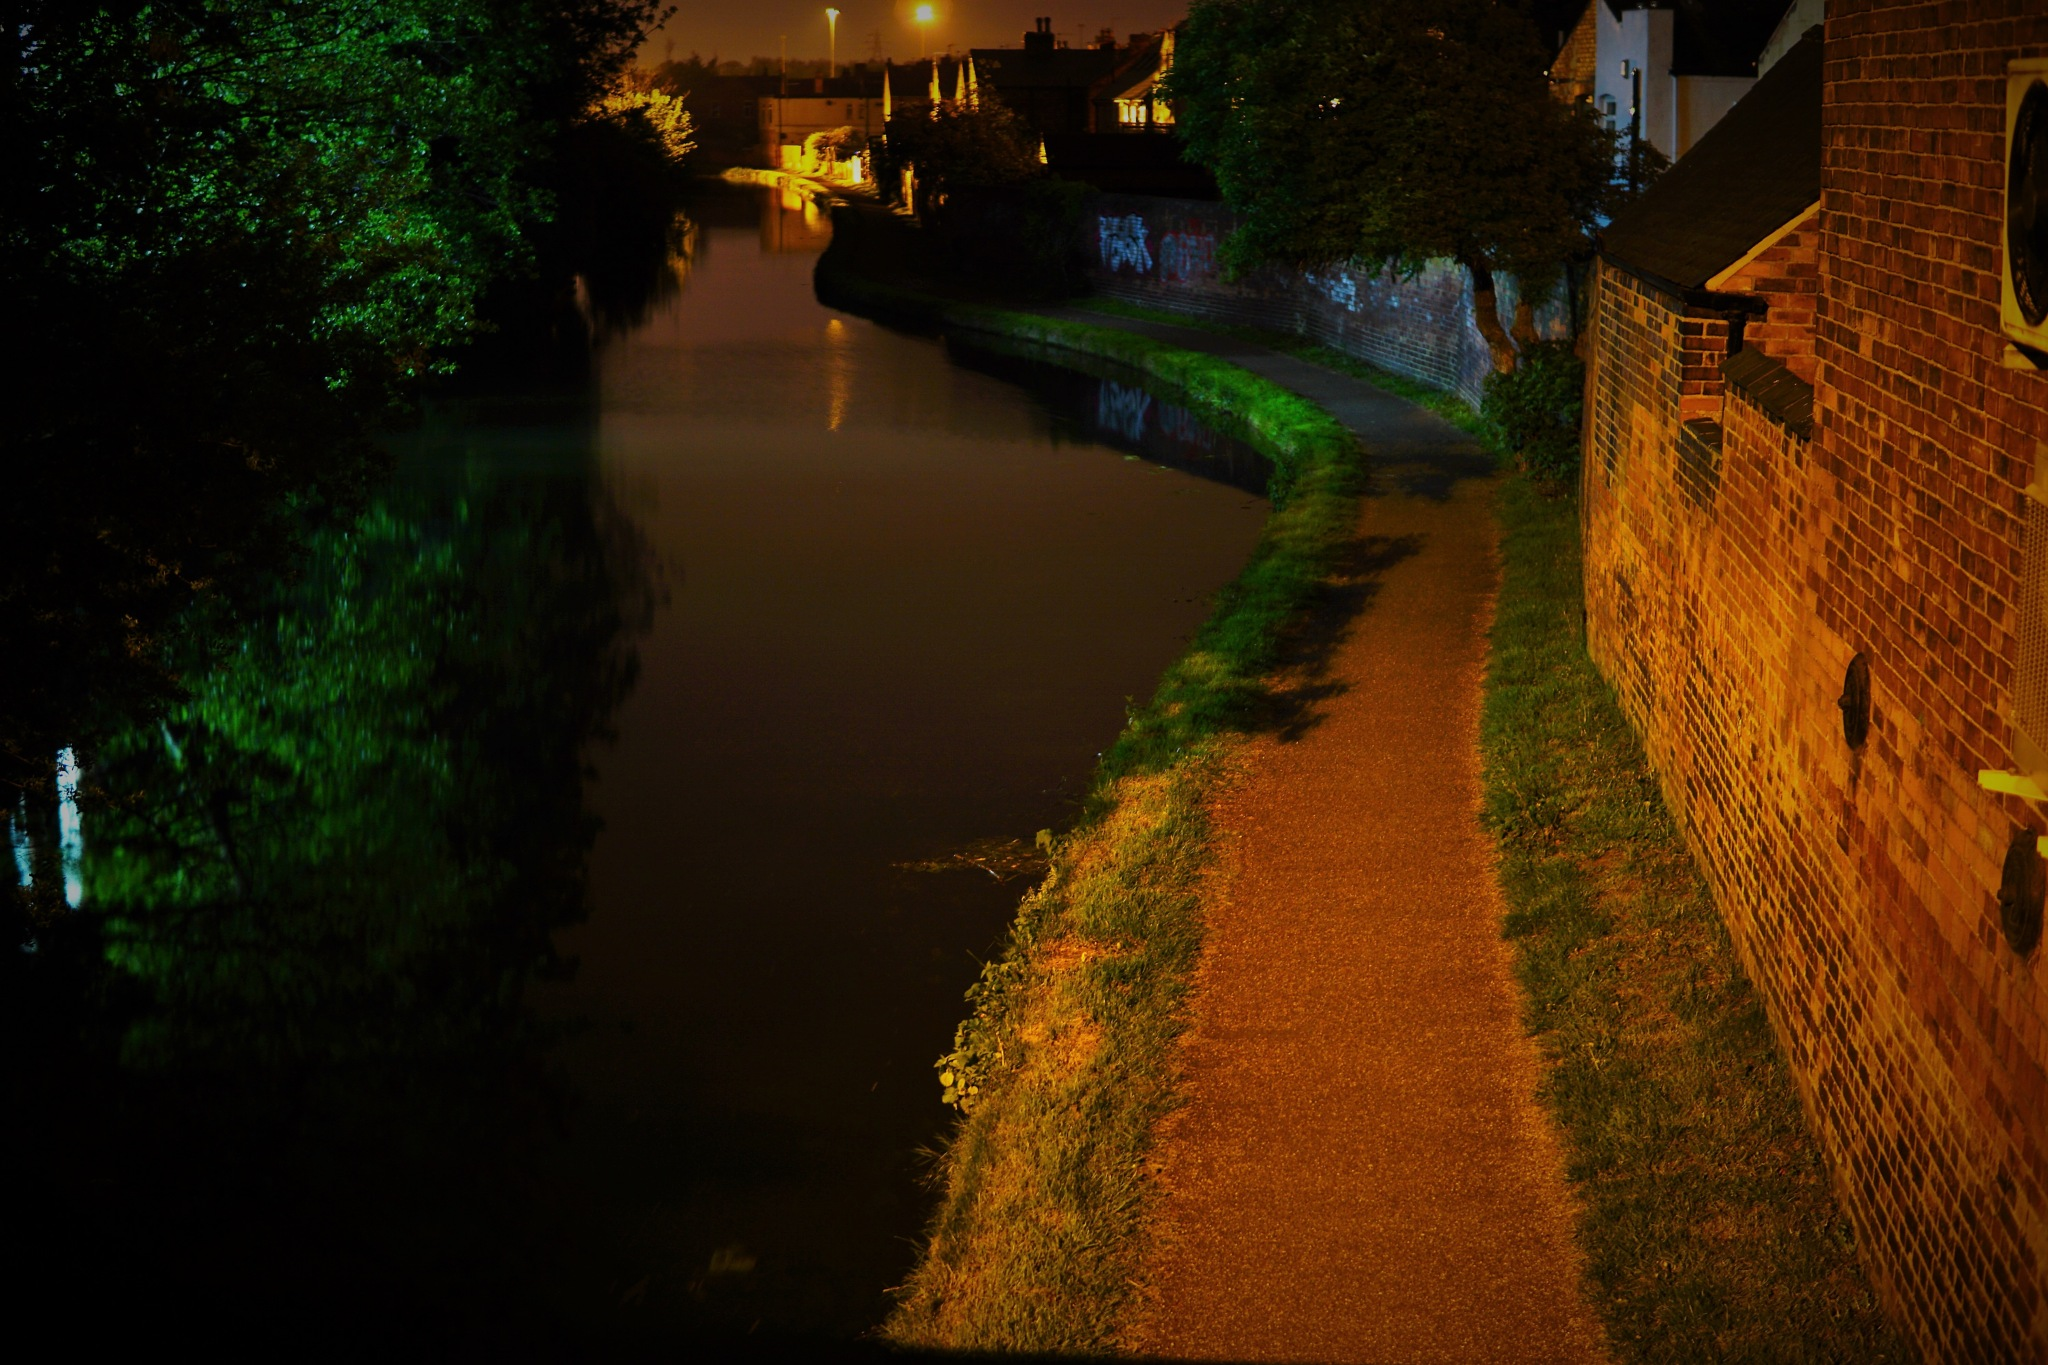 Colourful night canal by AJ Yakstrangler Andy Jamieson